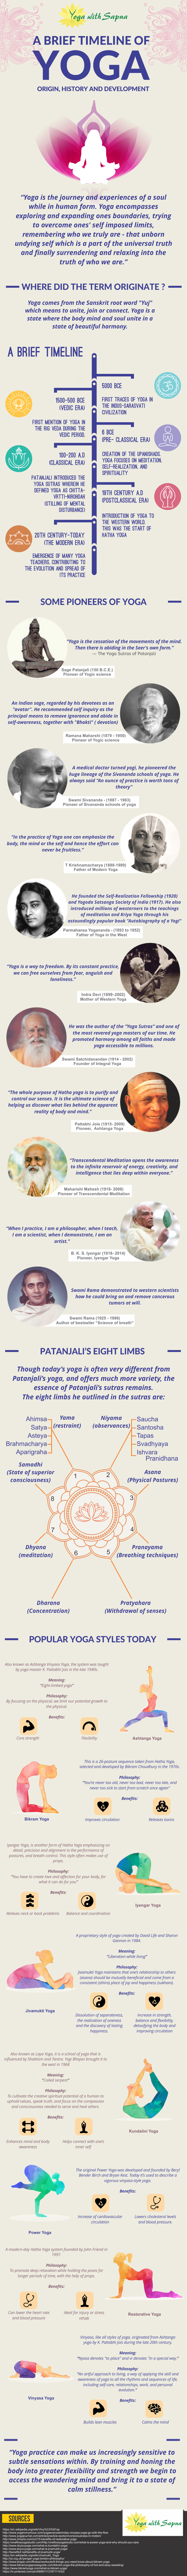 Yoga- Origin, History, and Development Infographic